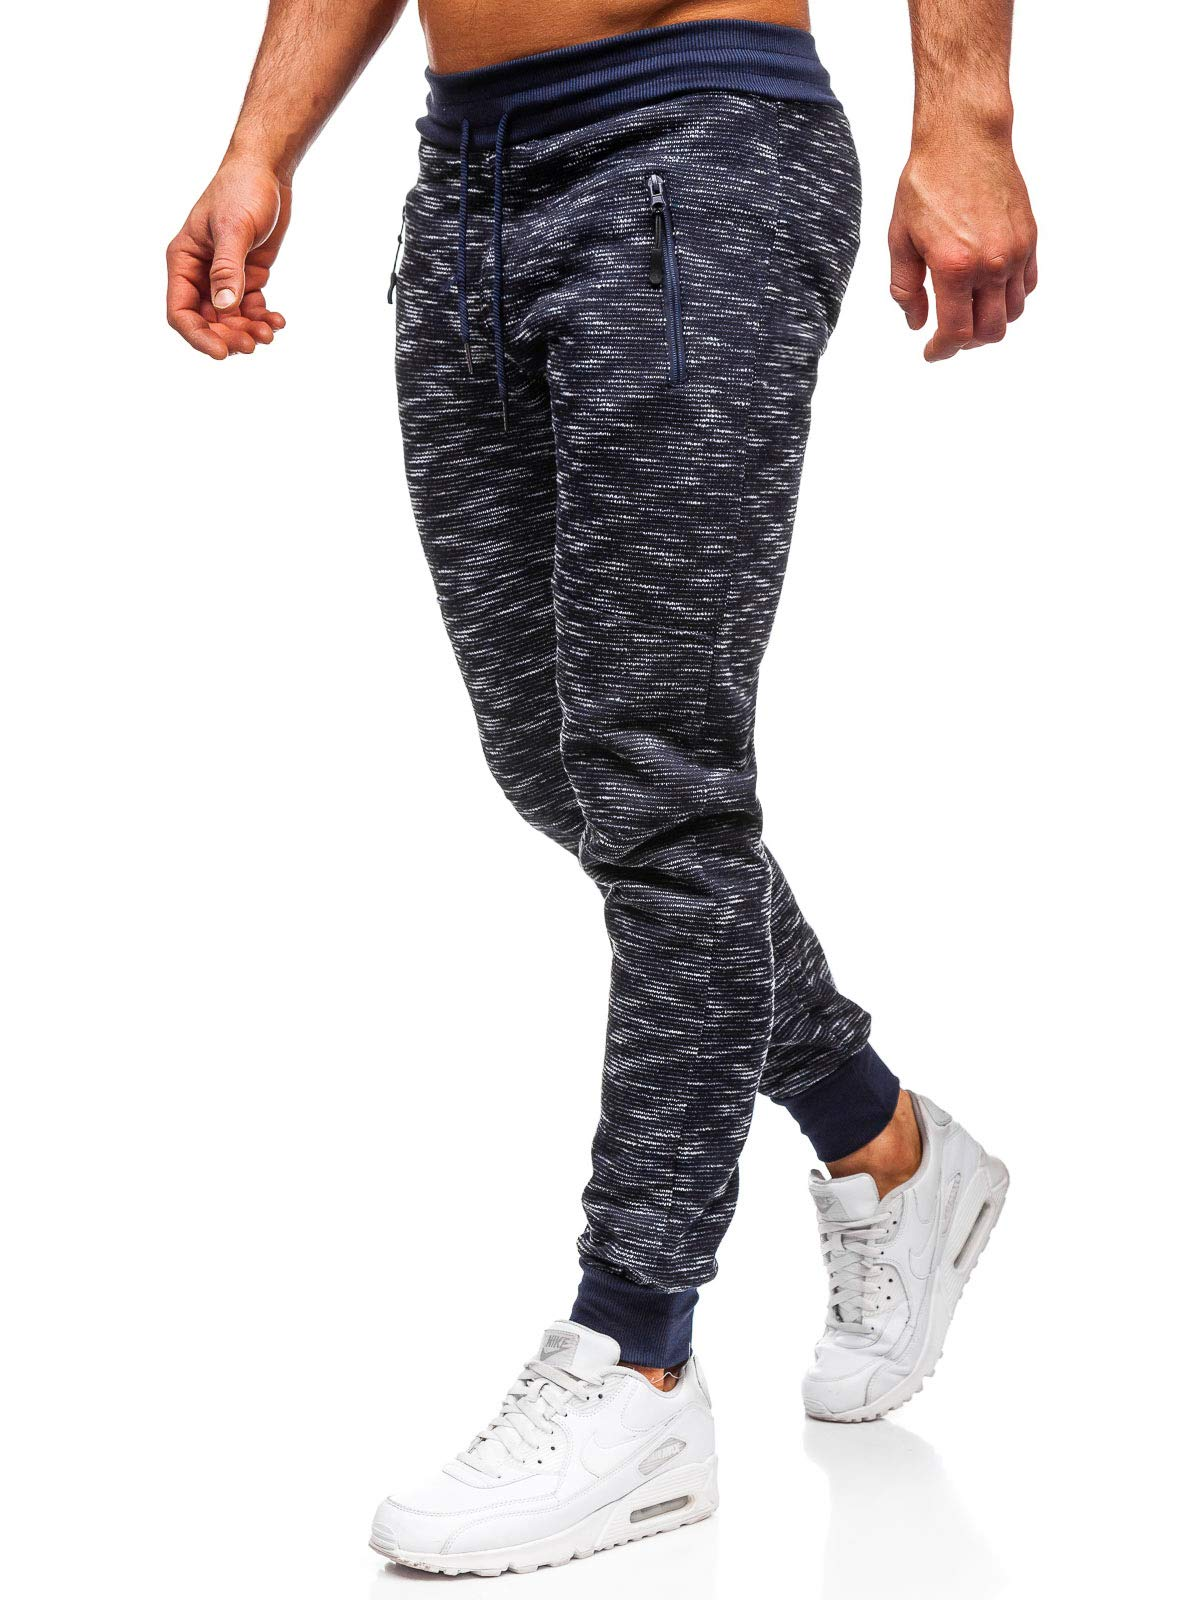 BOLF Sweatpants Pants Training Running Joggers Camo Active Mens Mix 6F6 Trousers